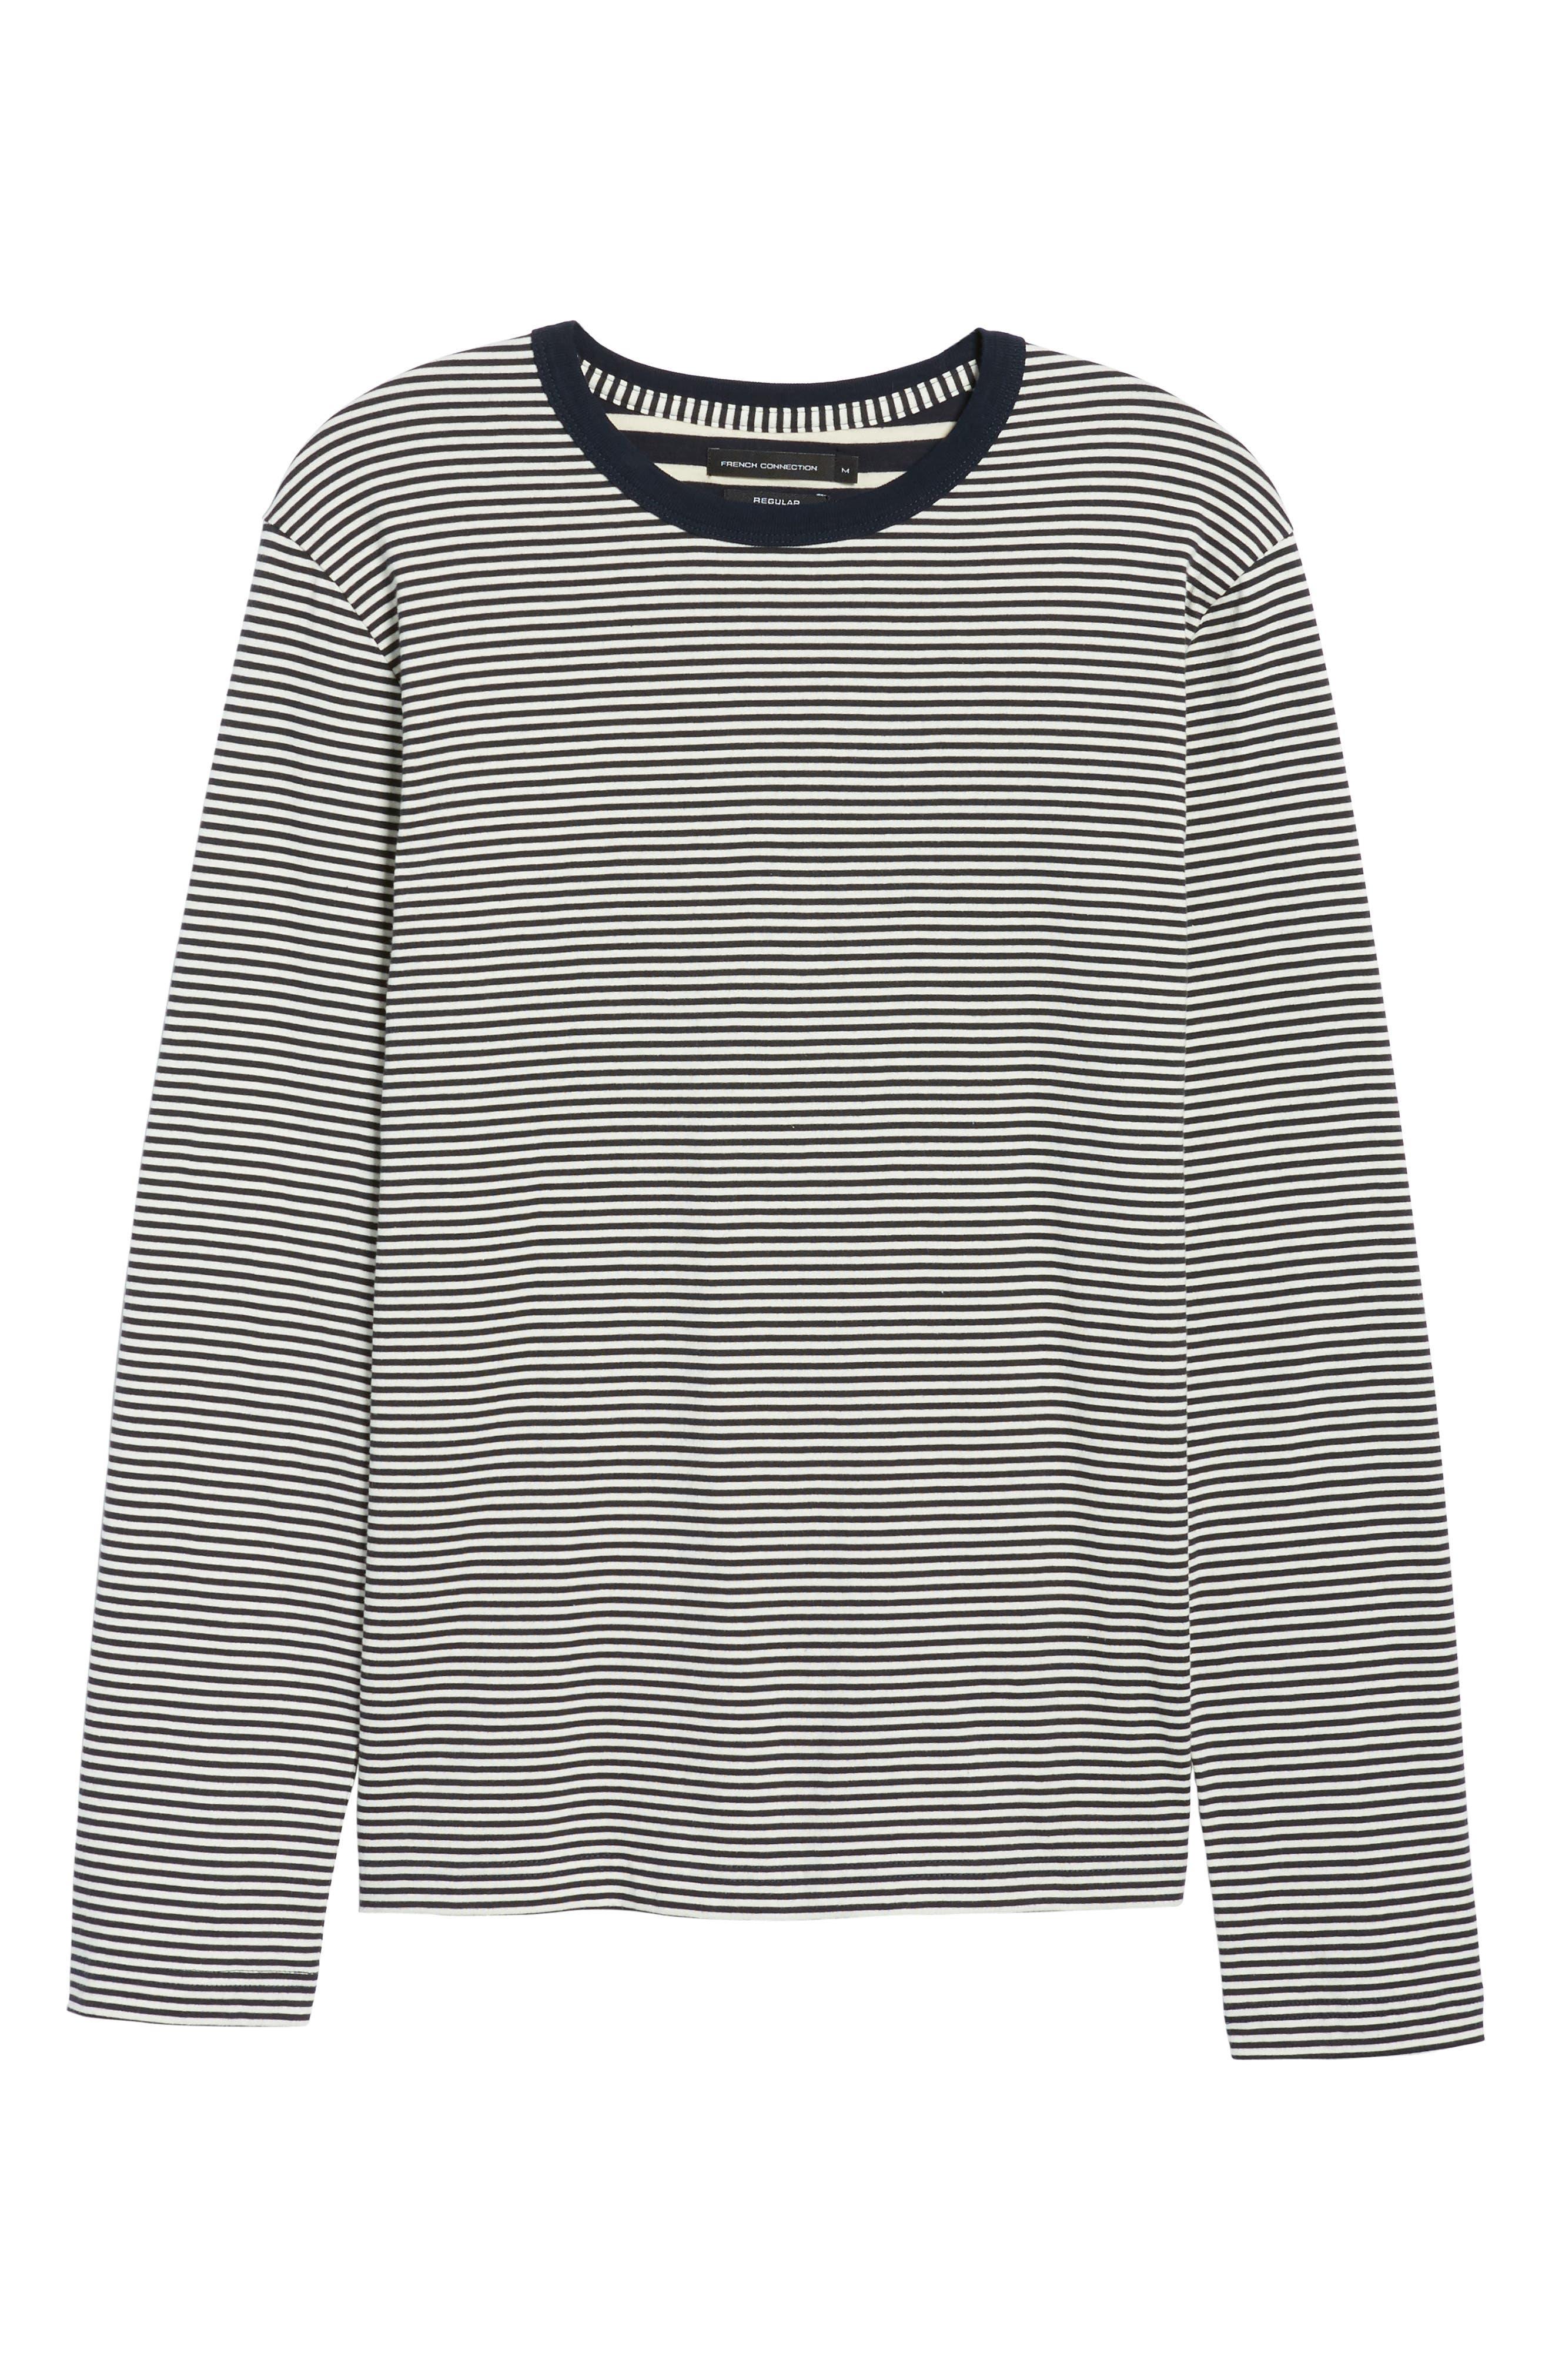 Mix Stripe Long Sleeve T-Shirt,                             Alternate thumbnail 6, color,                             Turtle Dove/ Marine Blue